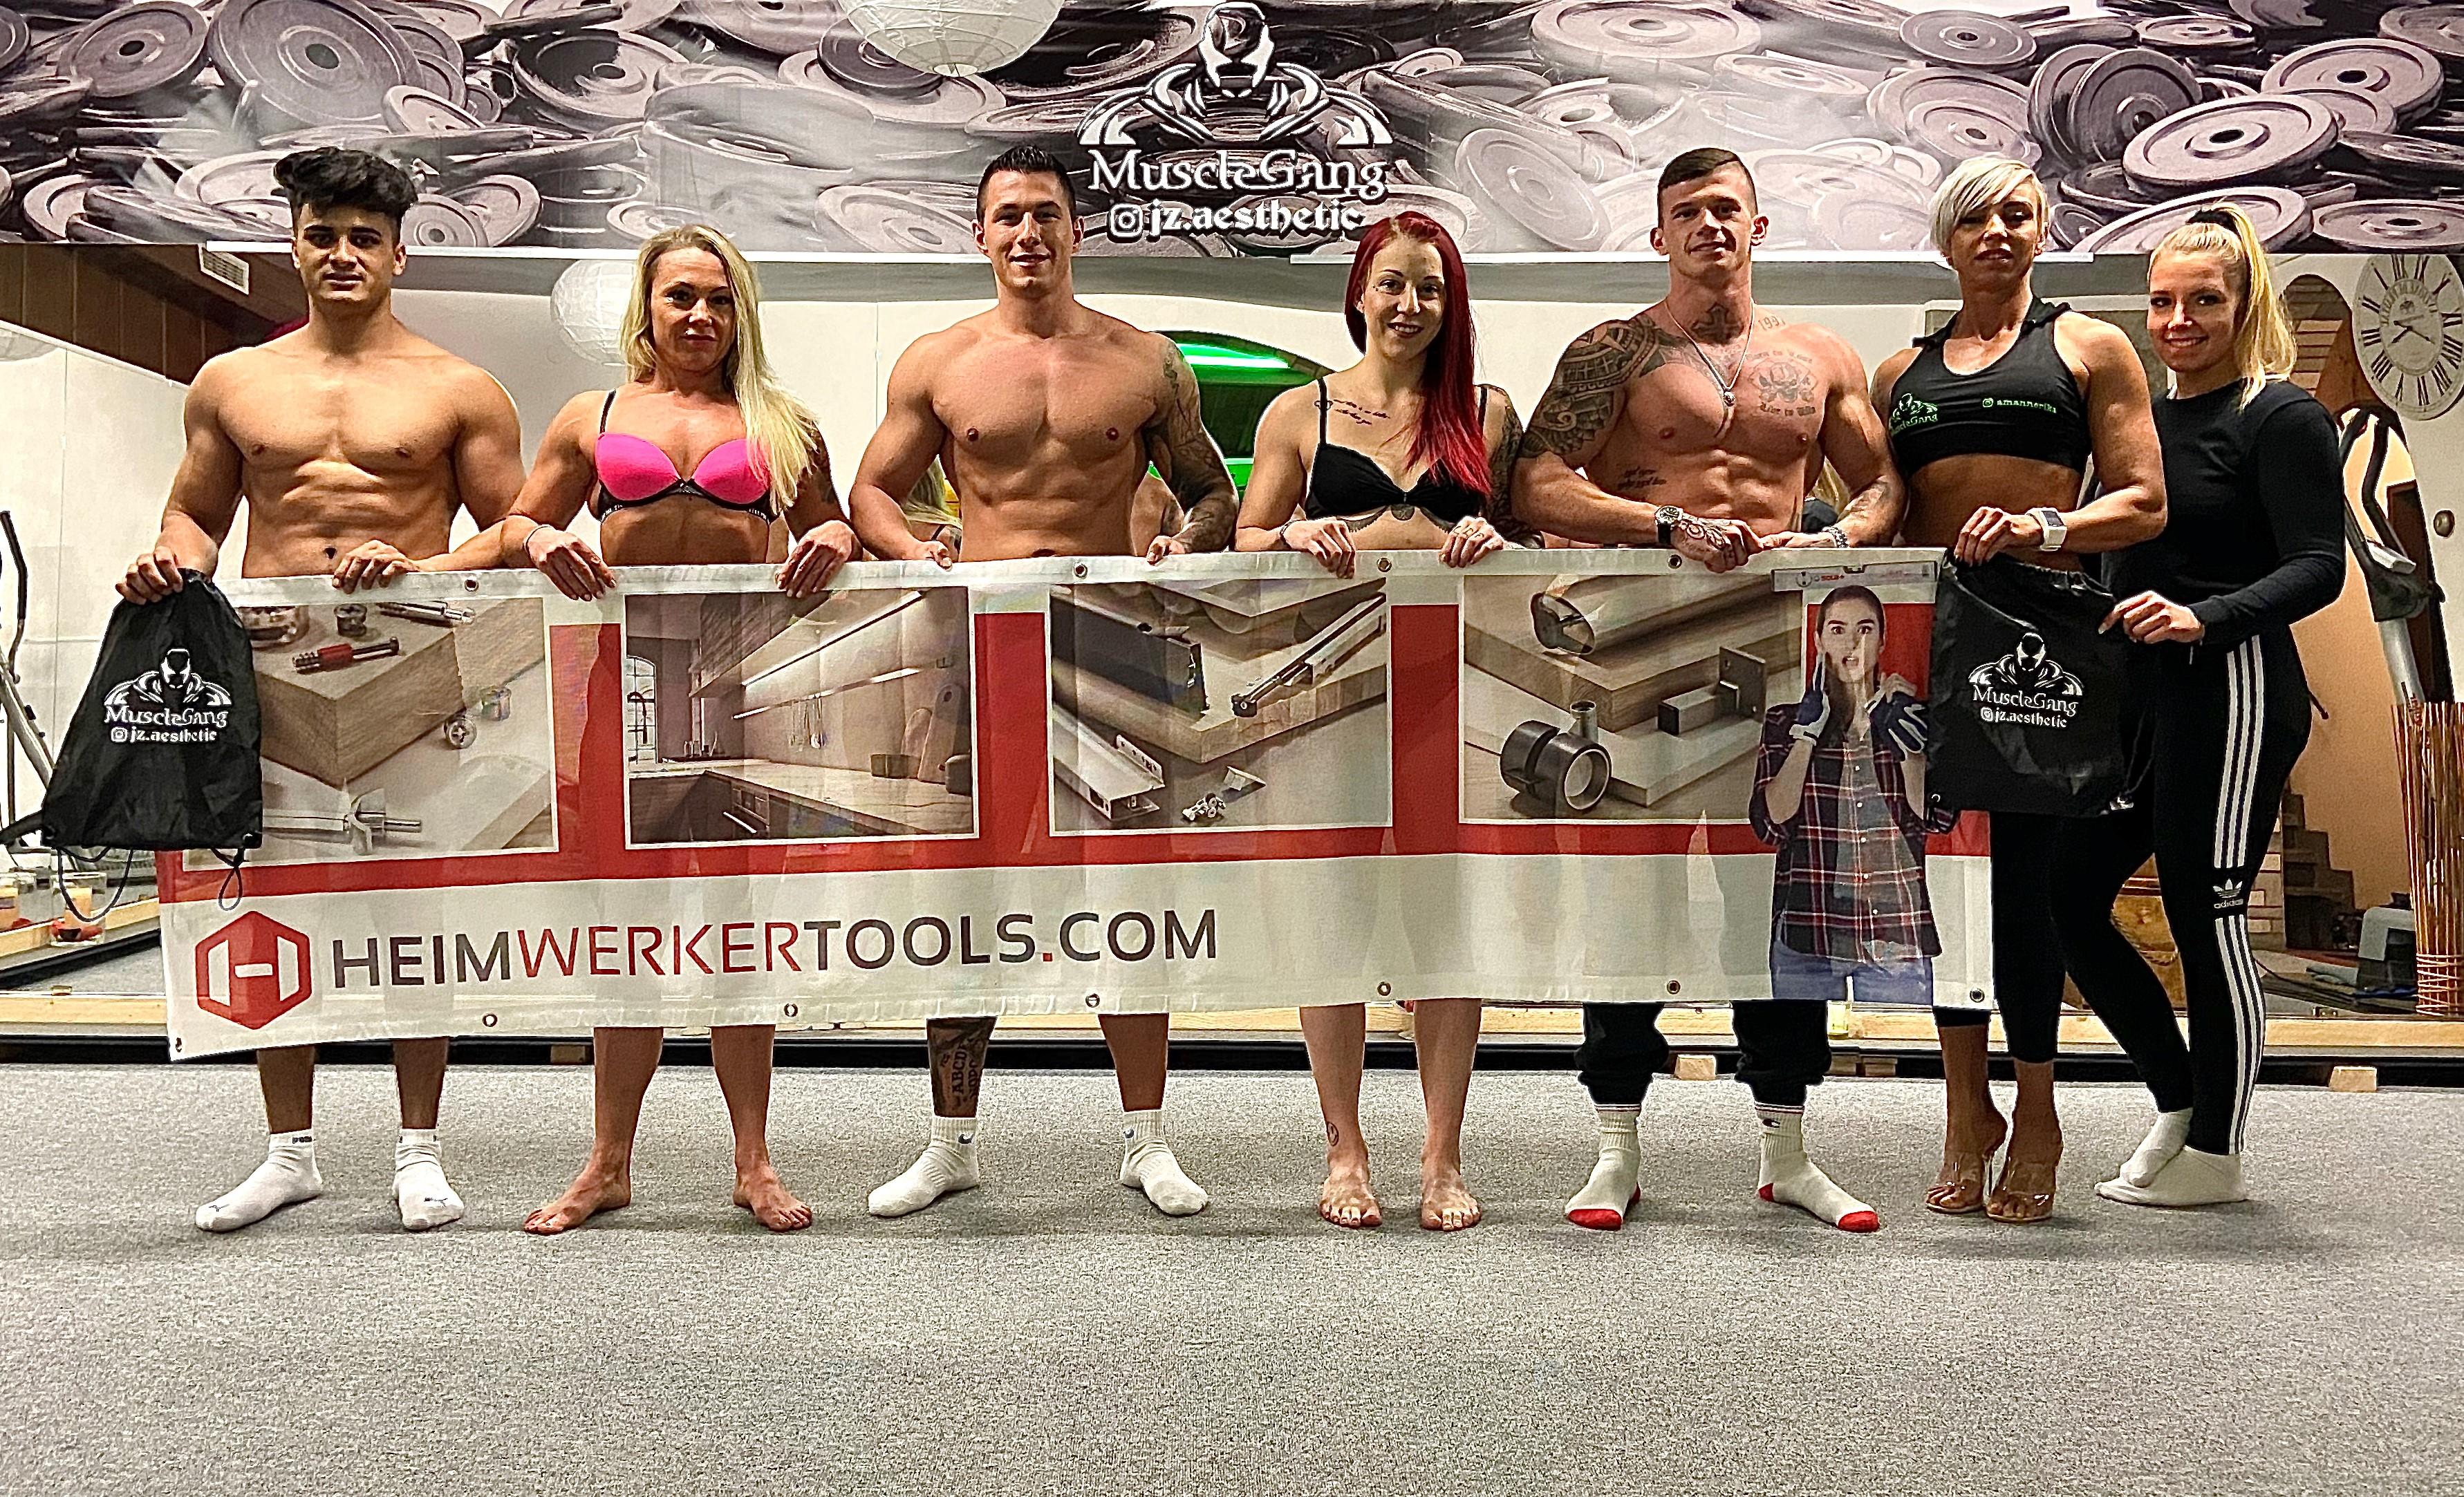 Sponsoring Musclegang